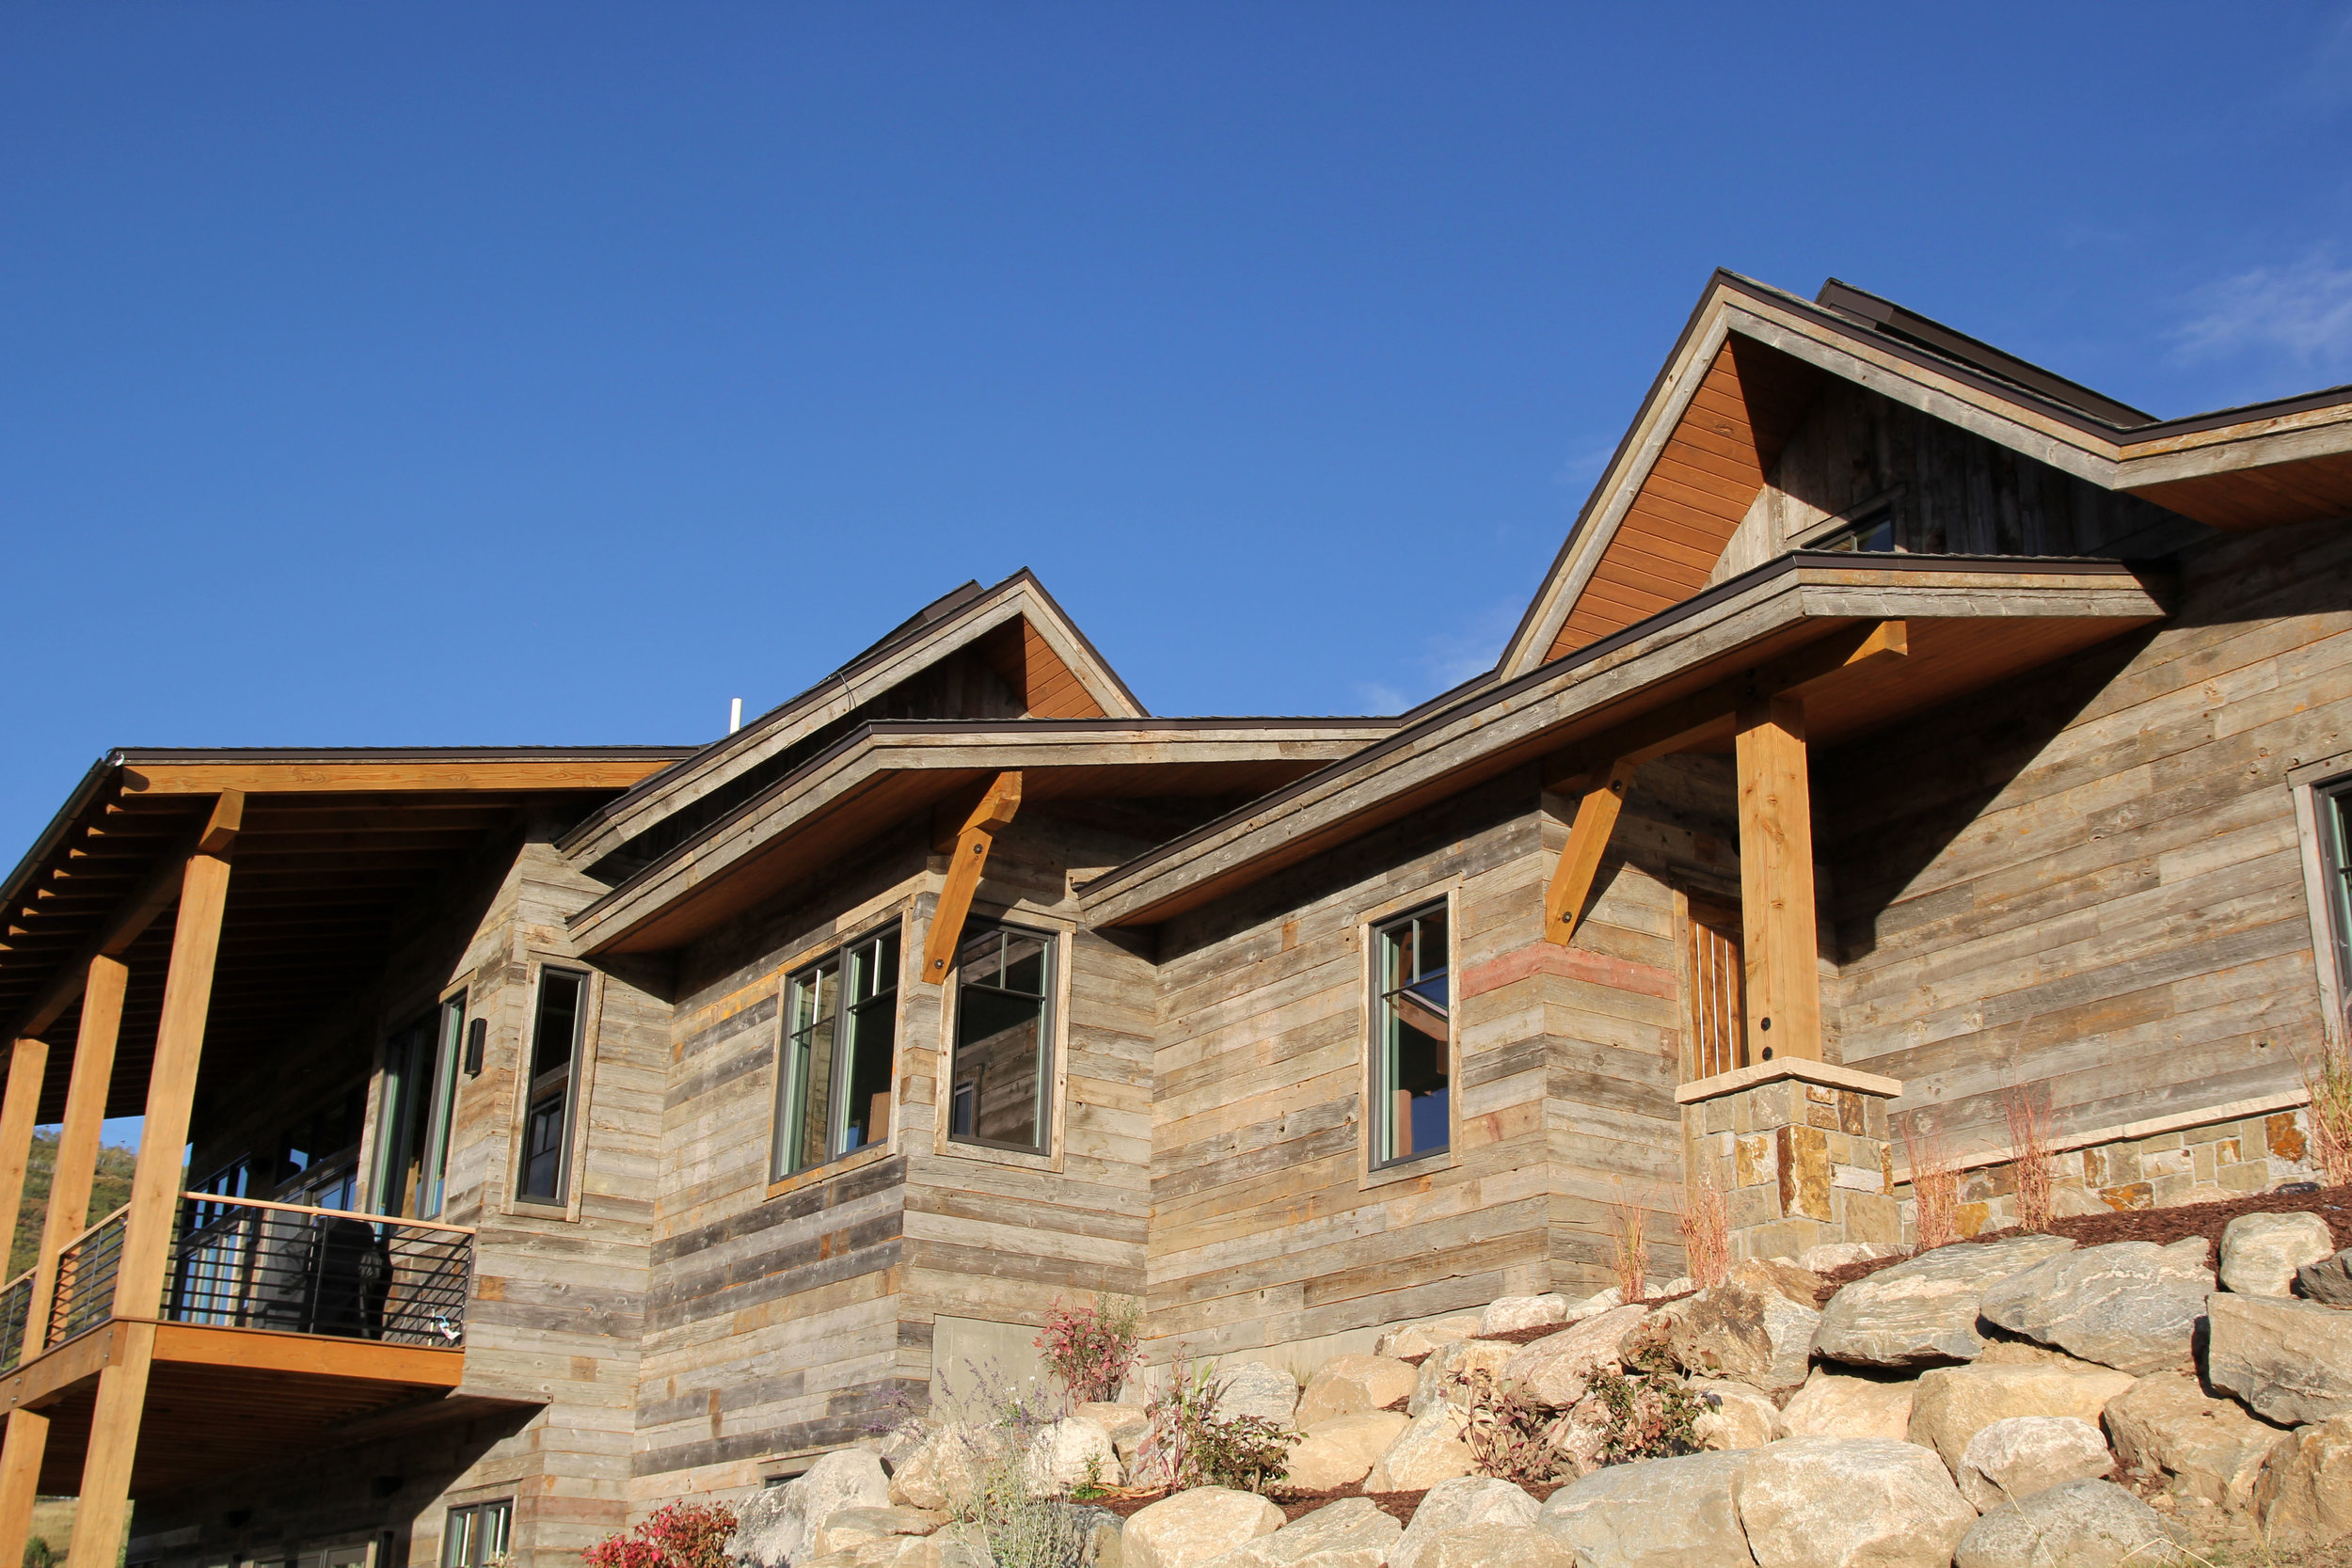 Colorado Residential Architect Sudol 10.jpg